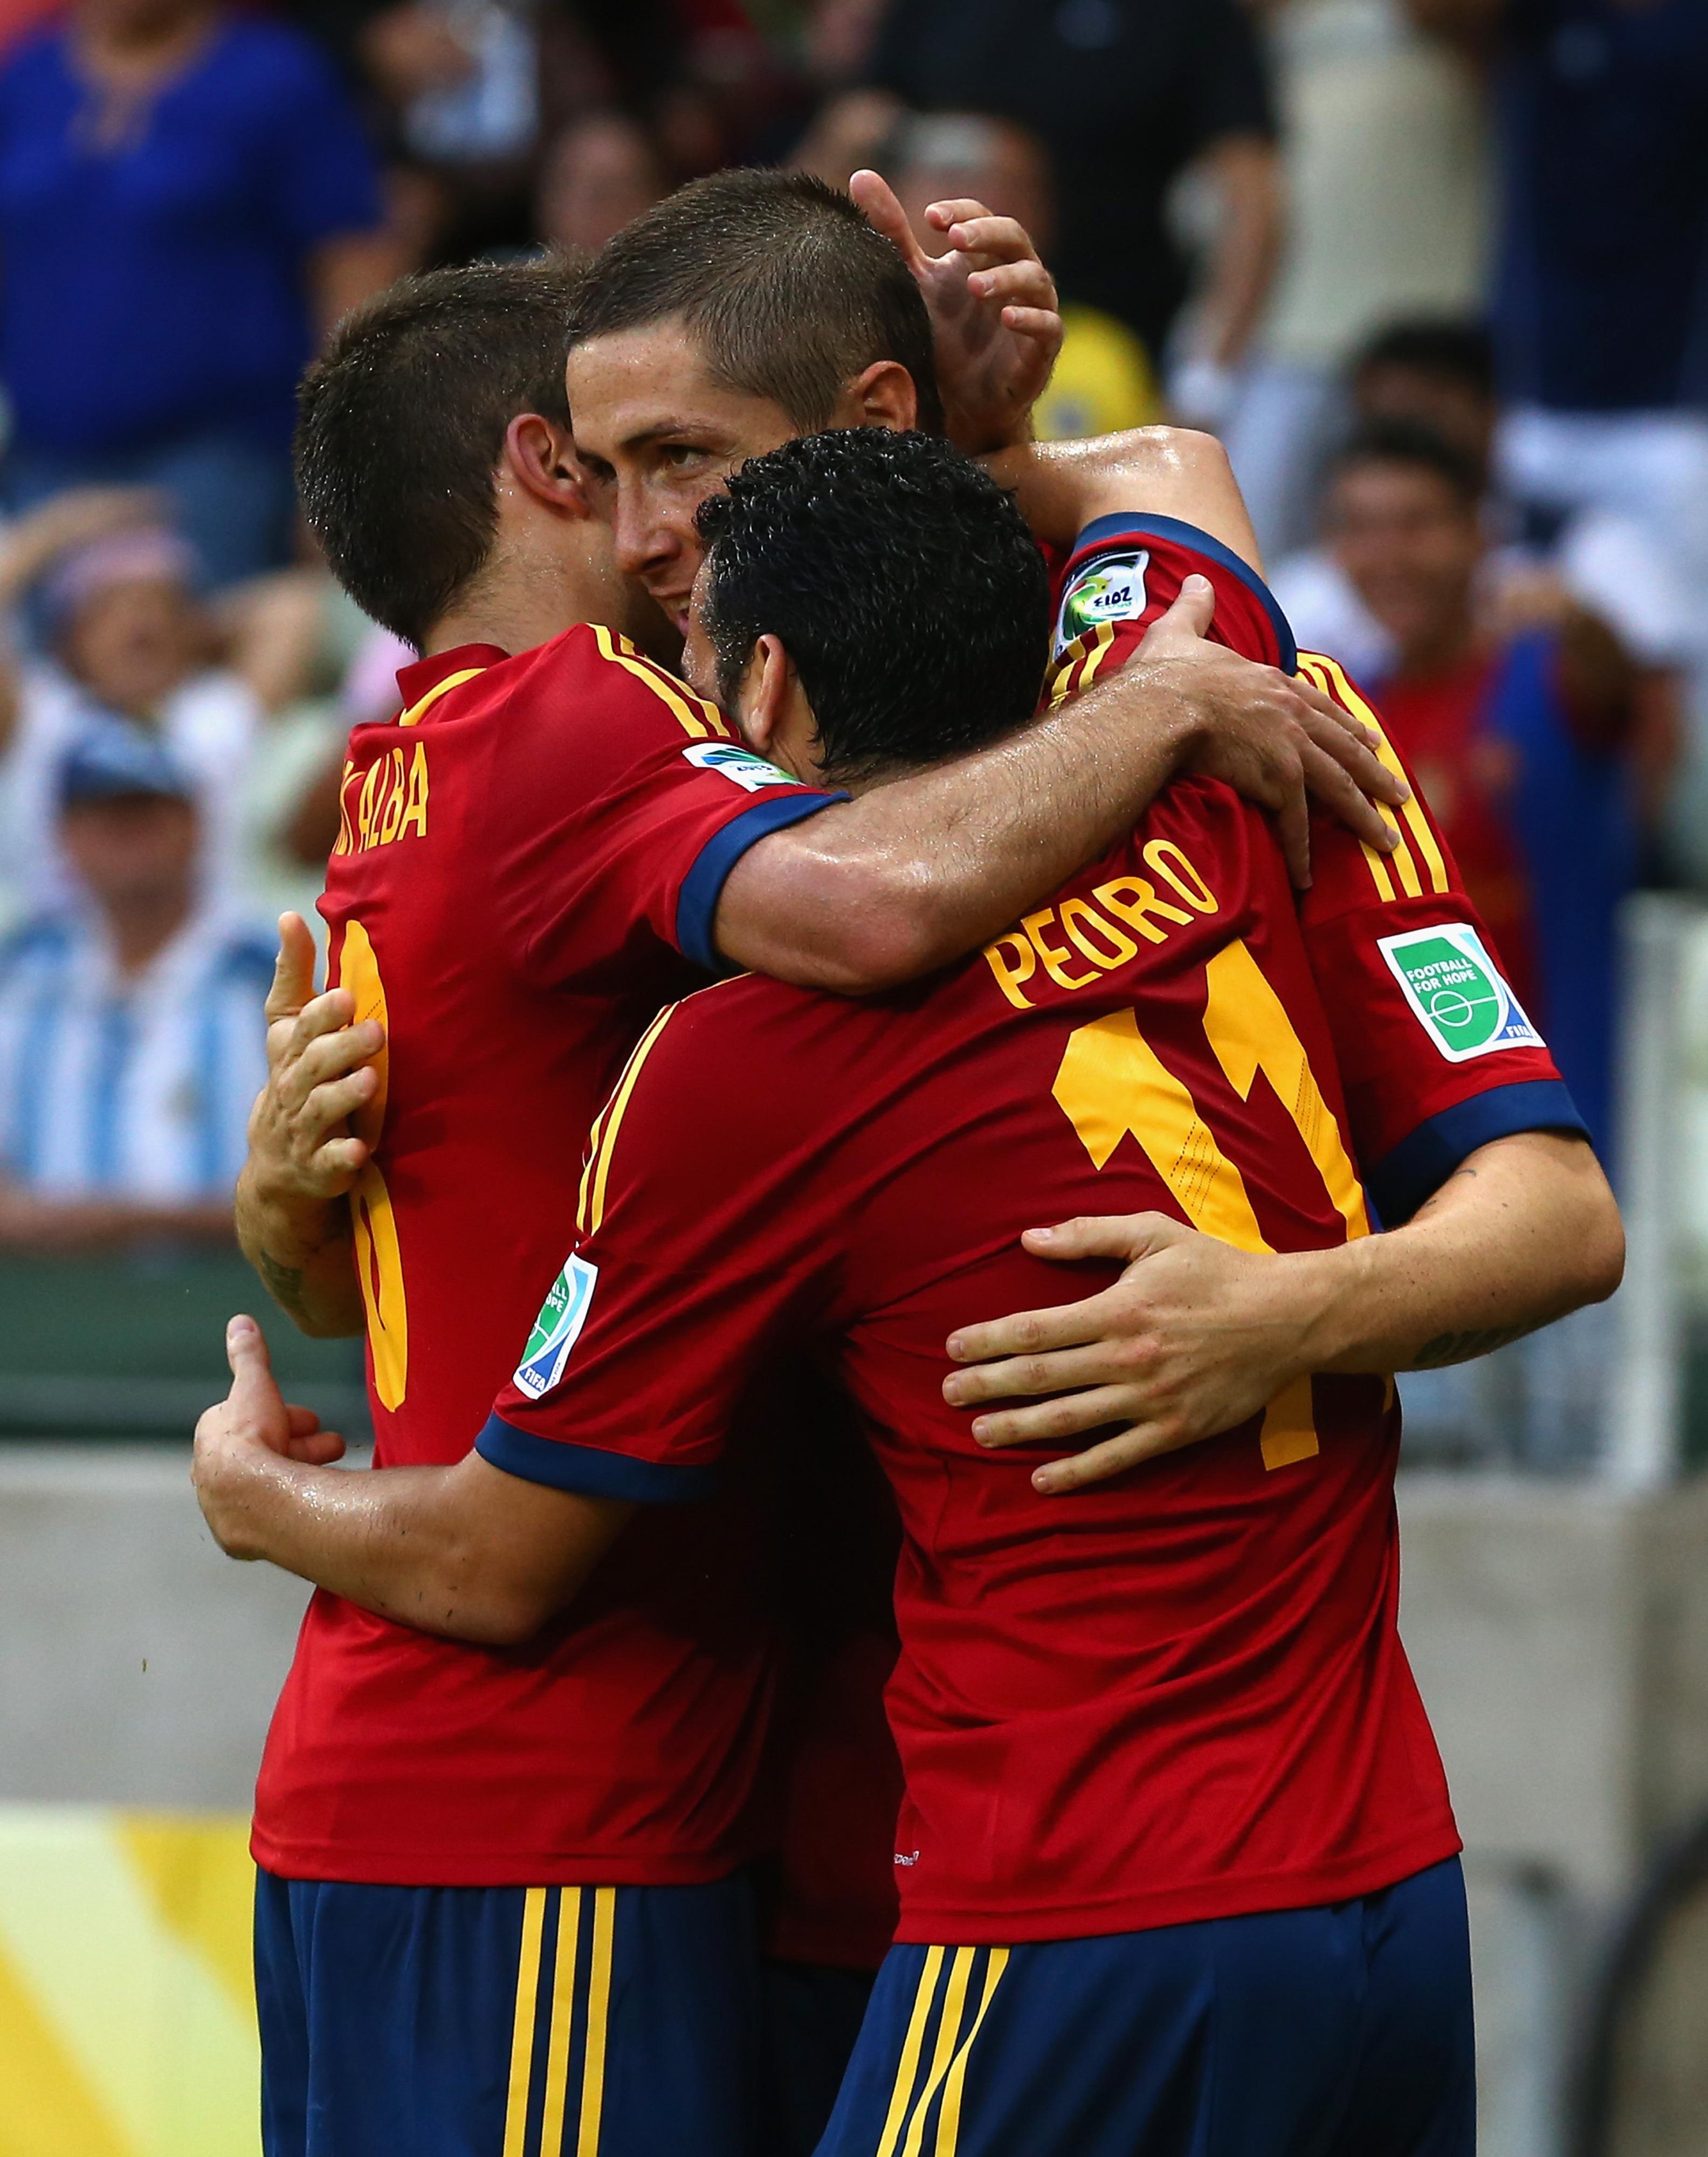 Confederations Cup 2013: Spain, Uruguay advance to set semifinals